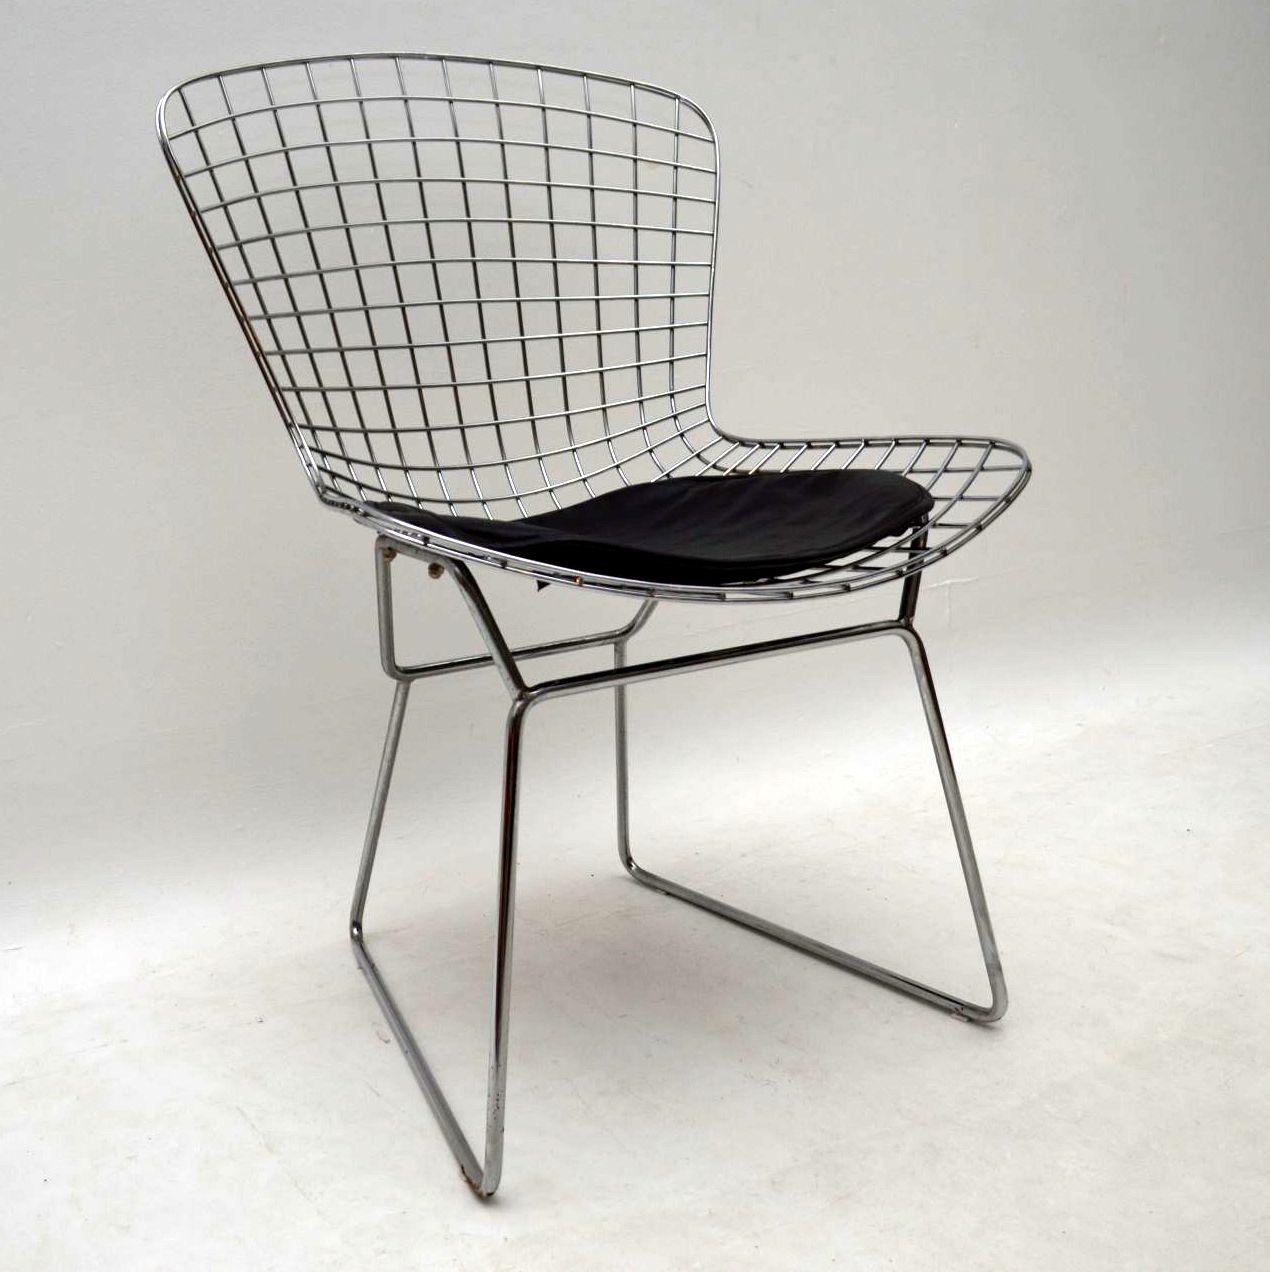 Pair Of Vintage Harry Bertoia Wire Chairs Retrospective